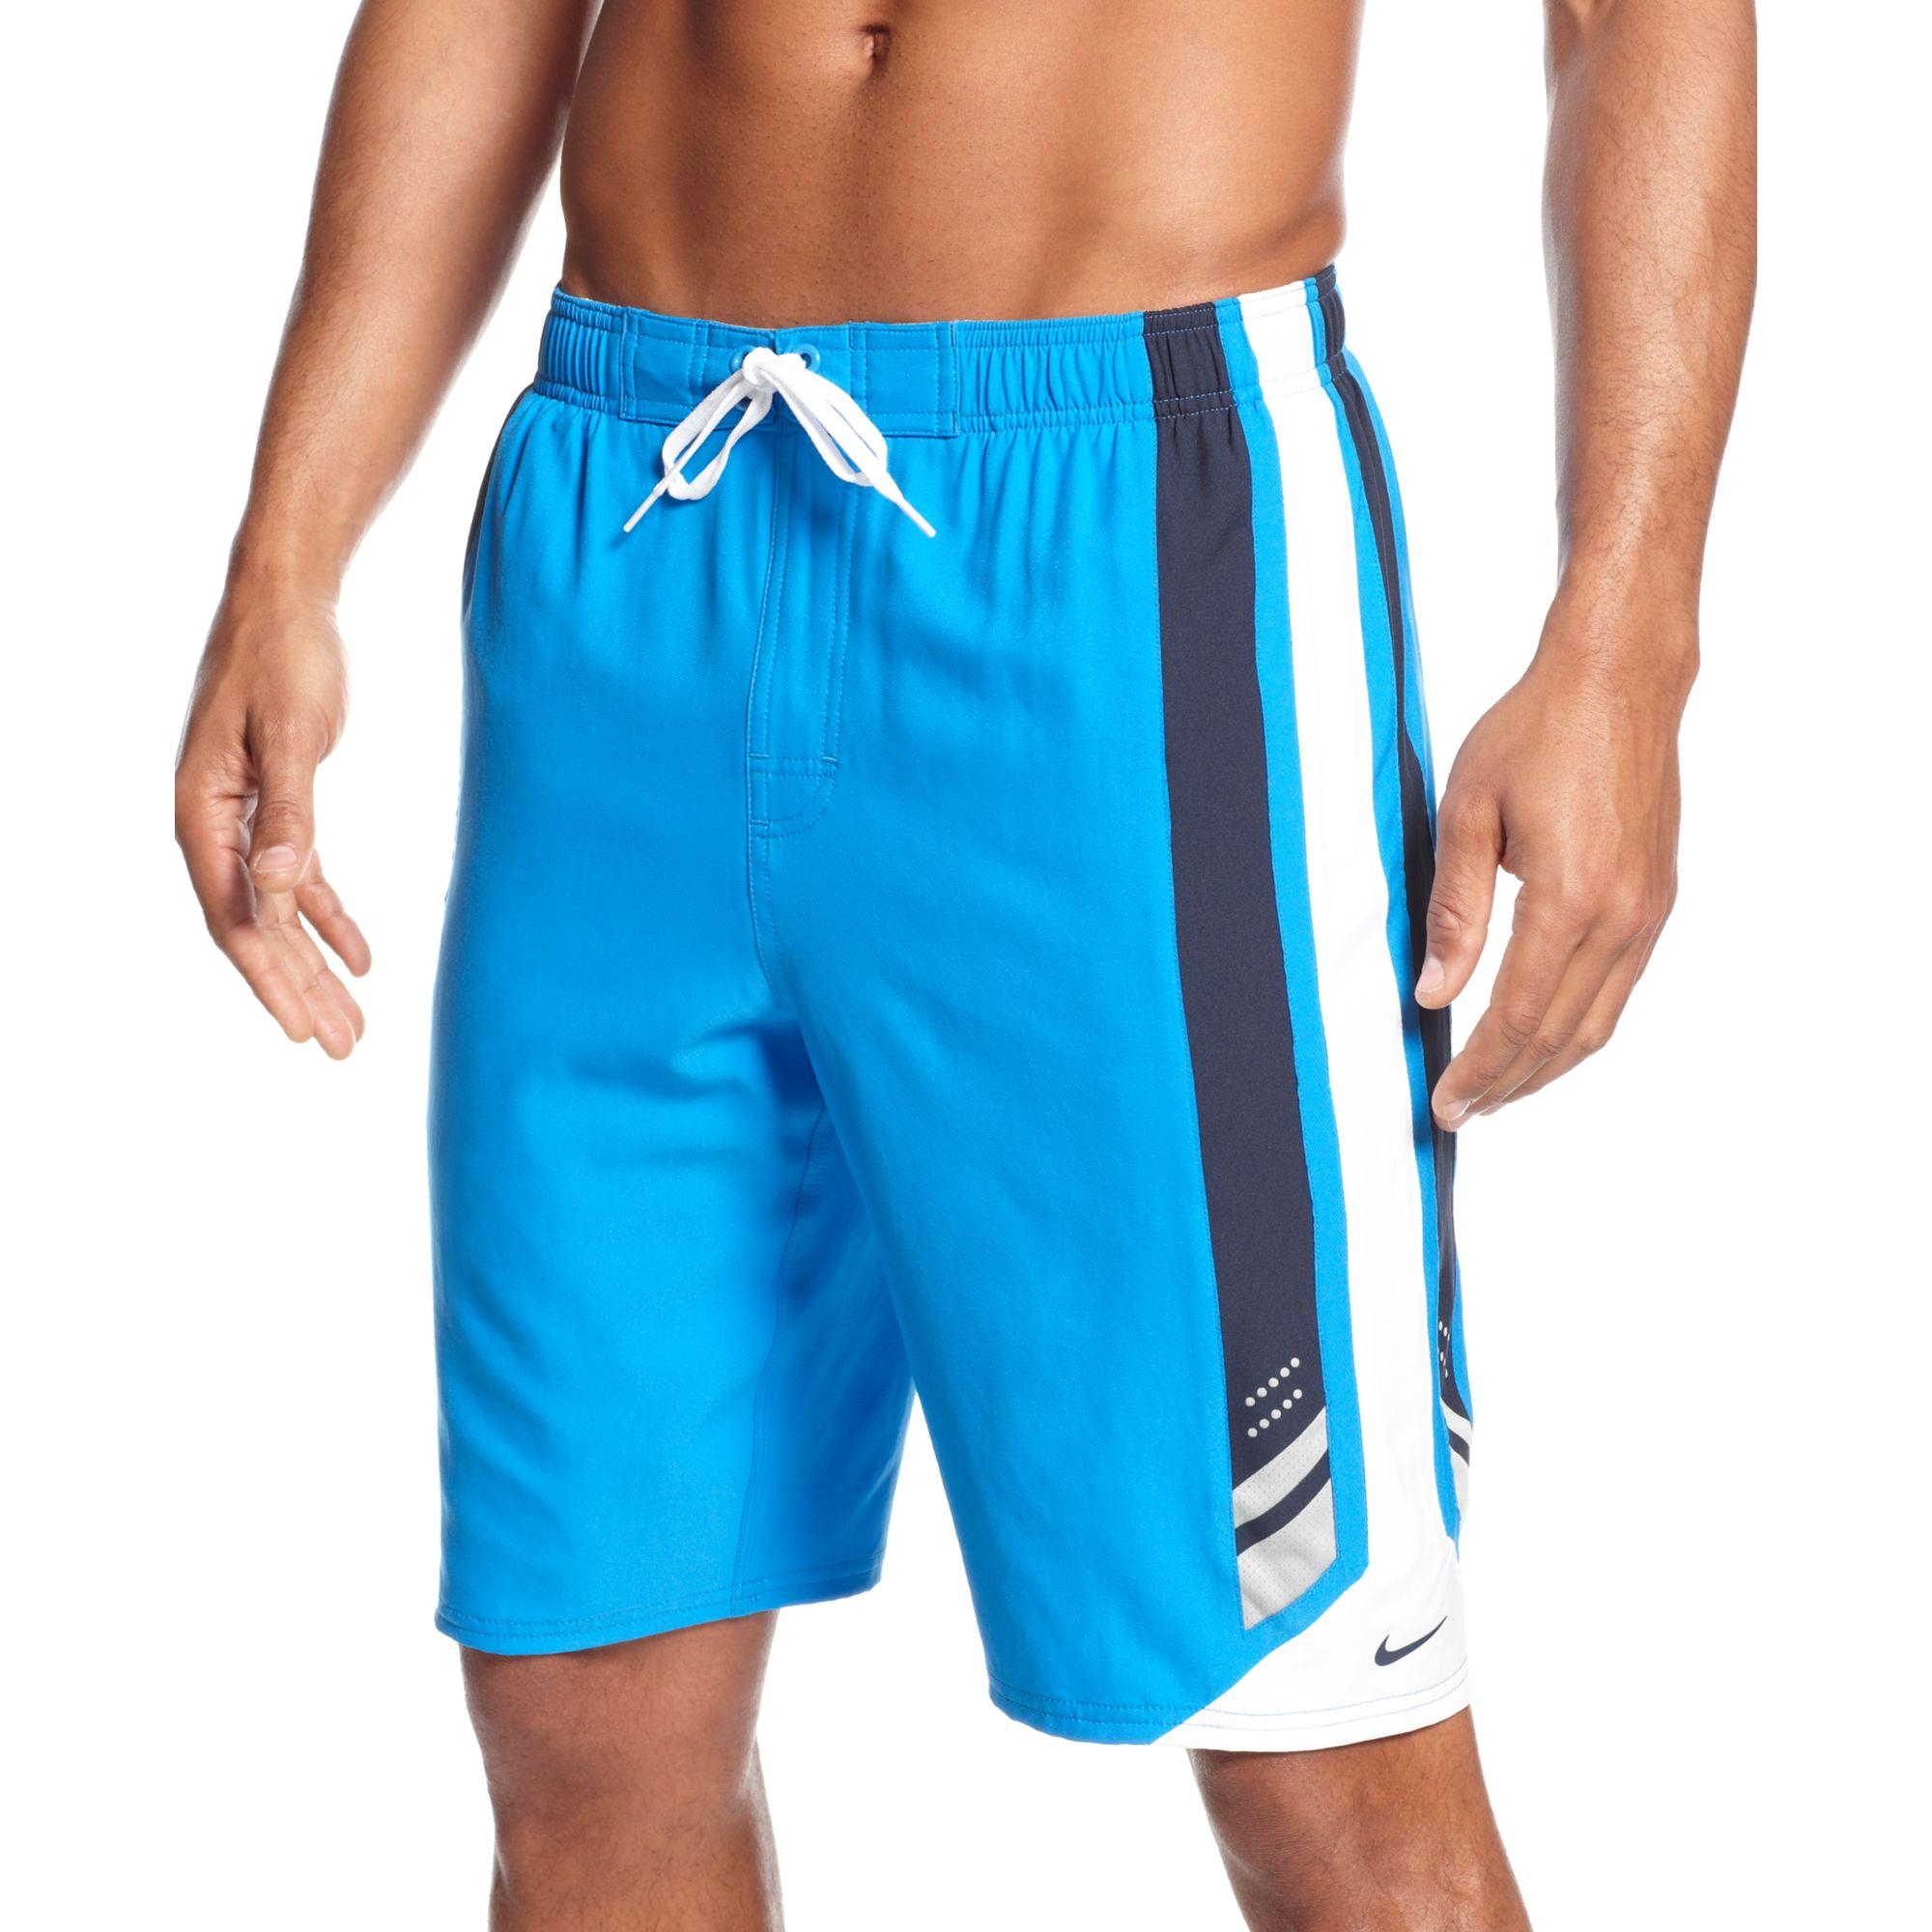 ee2e390f77 Nike Transcend 11 Volley Dri Fit Swim Shorts in Blue for Men - Lyst